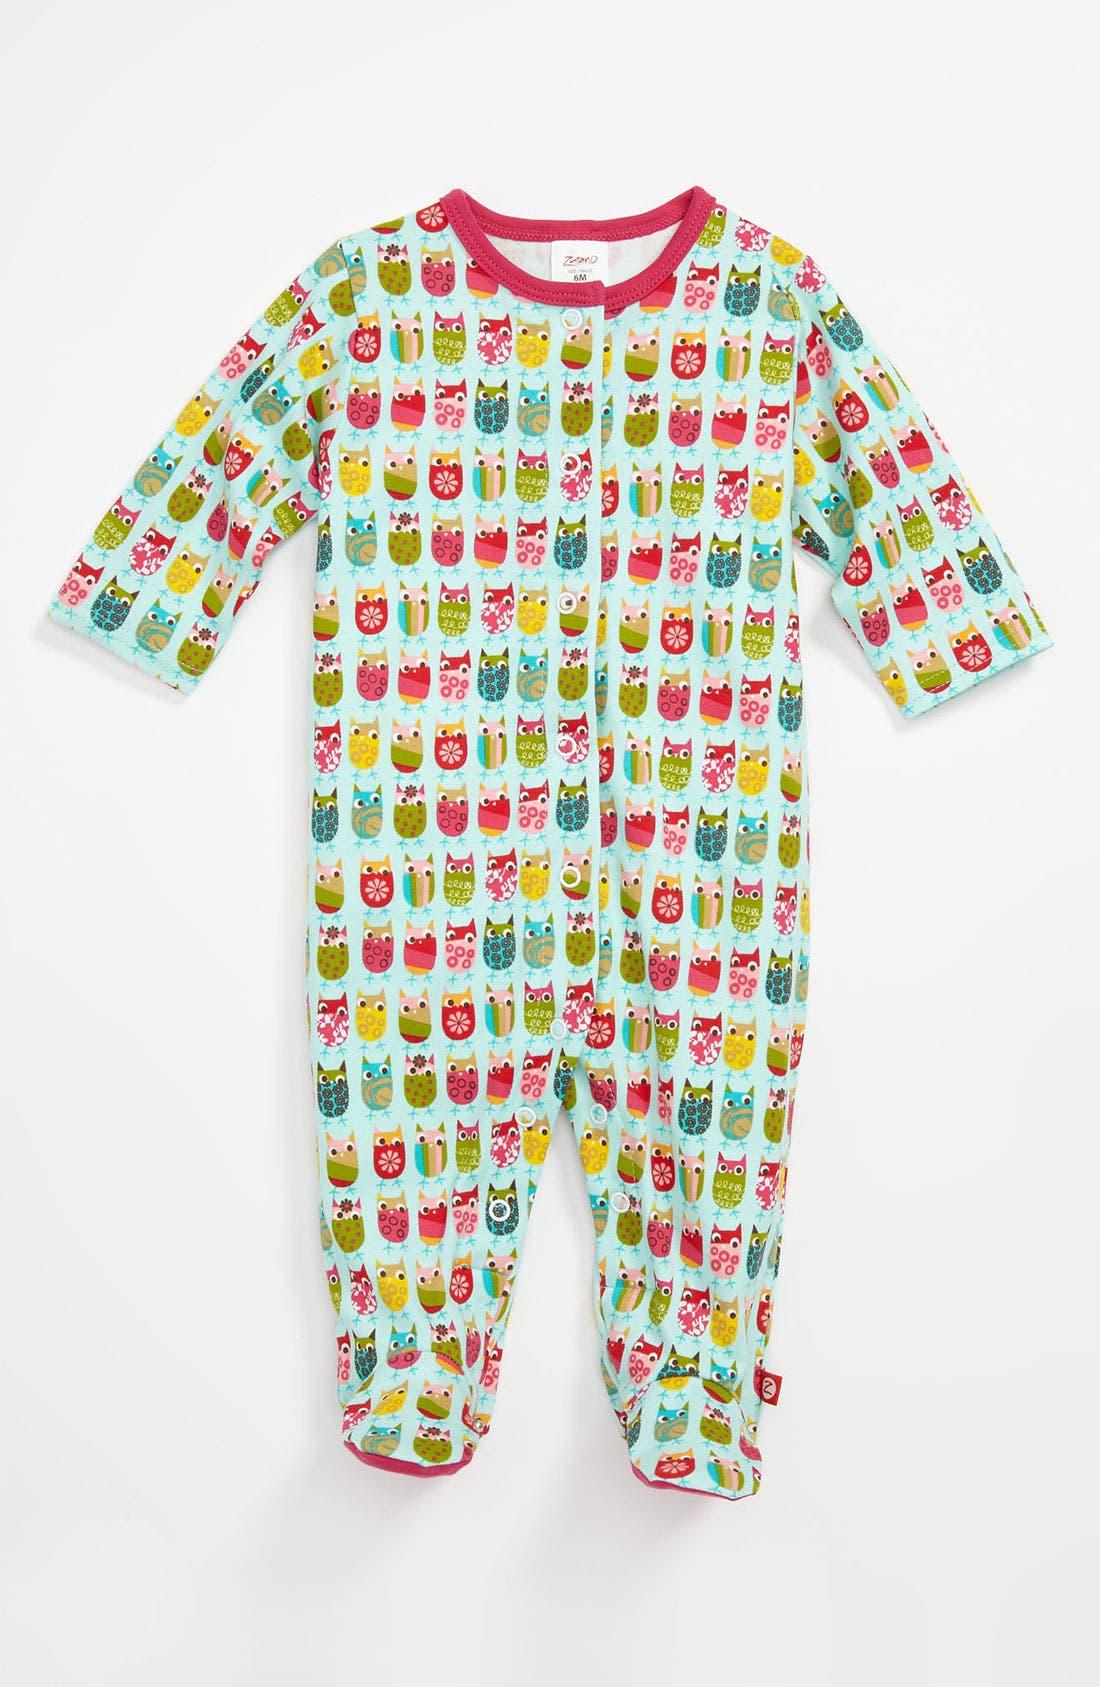 Alternate Image 1 Selected - Zutano 'Owls' Footie (Infant)